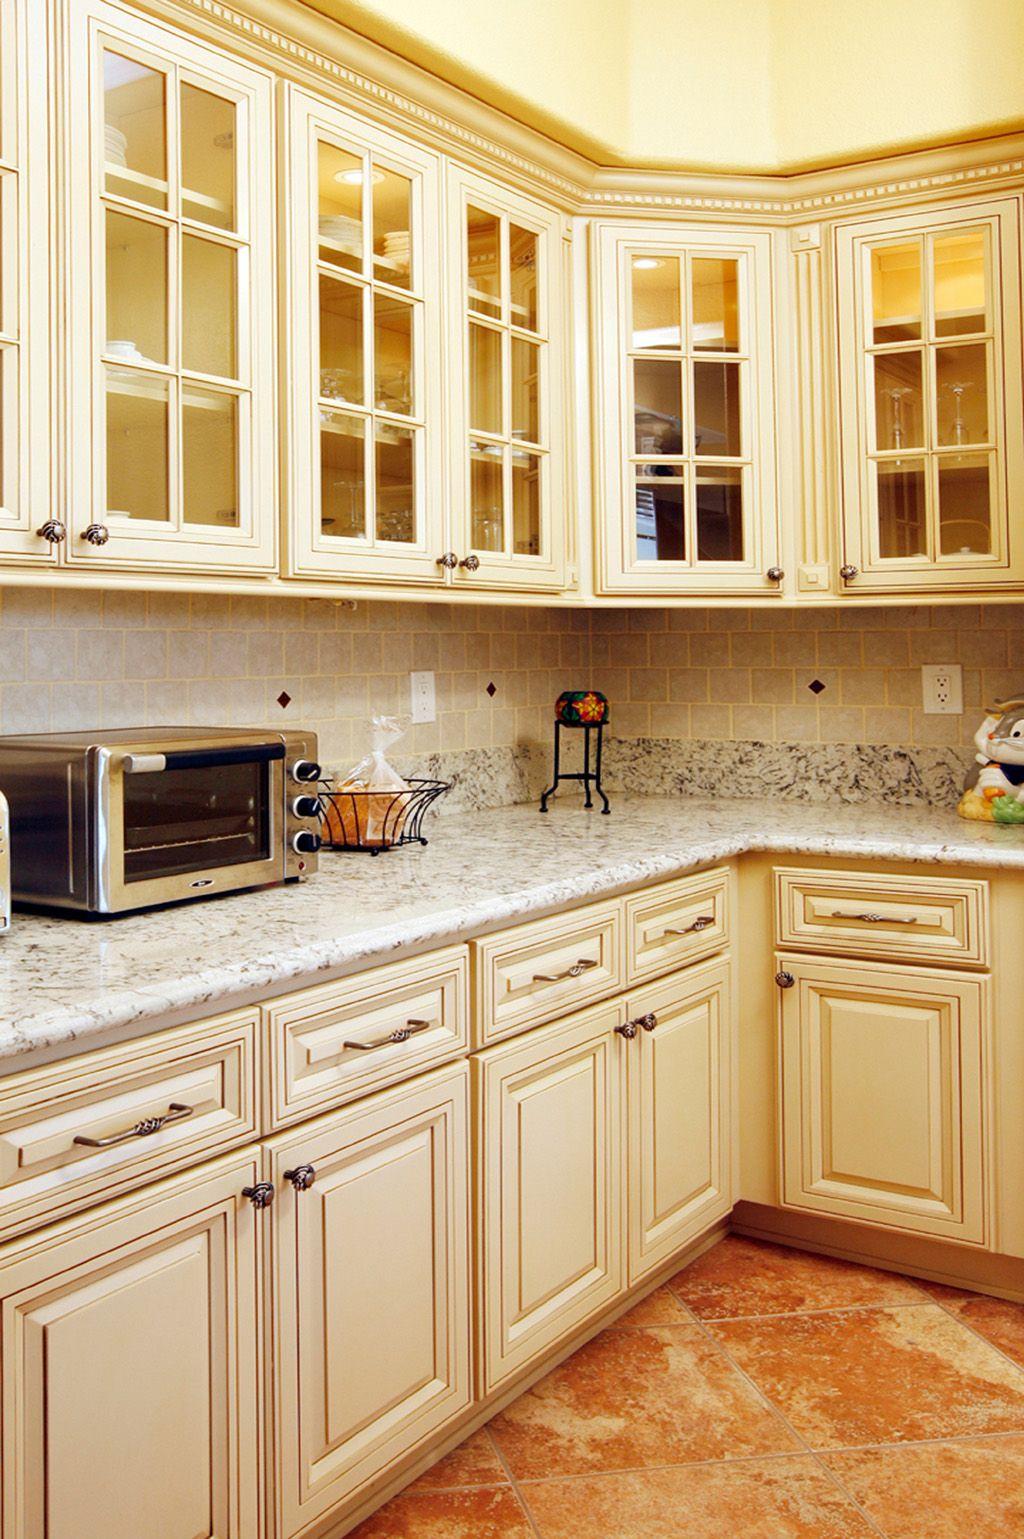 North American Maple Antique White Glaze Kitchen Cabinets